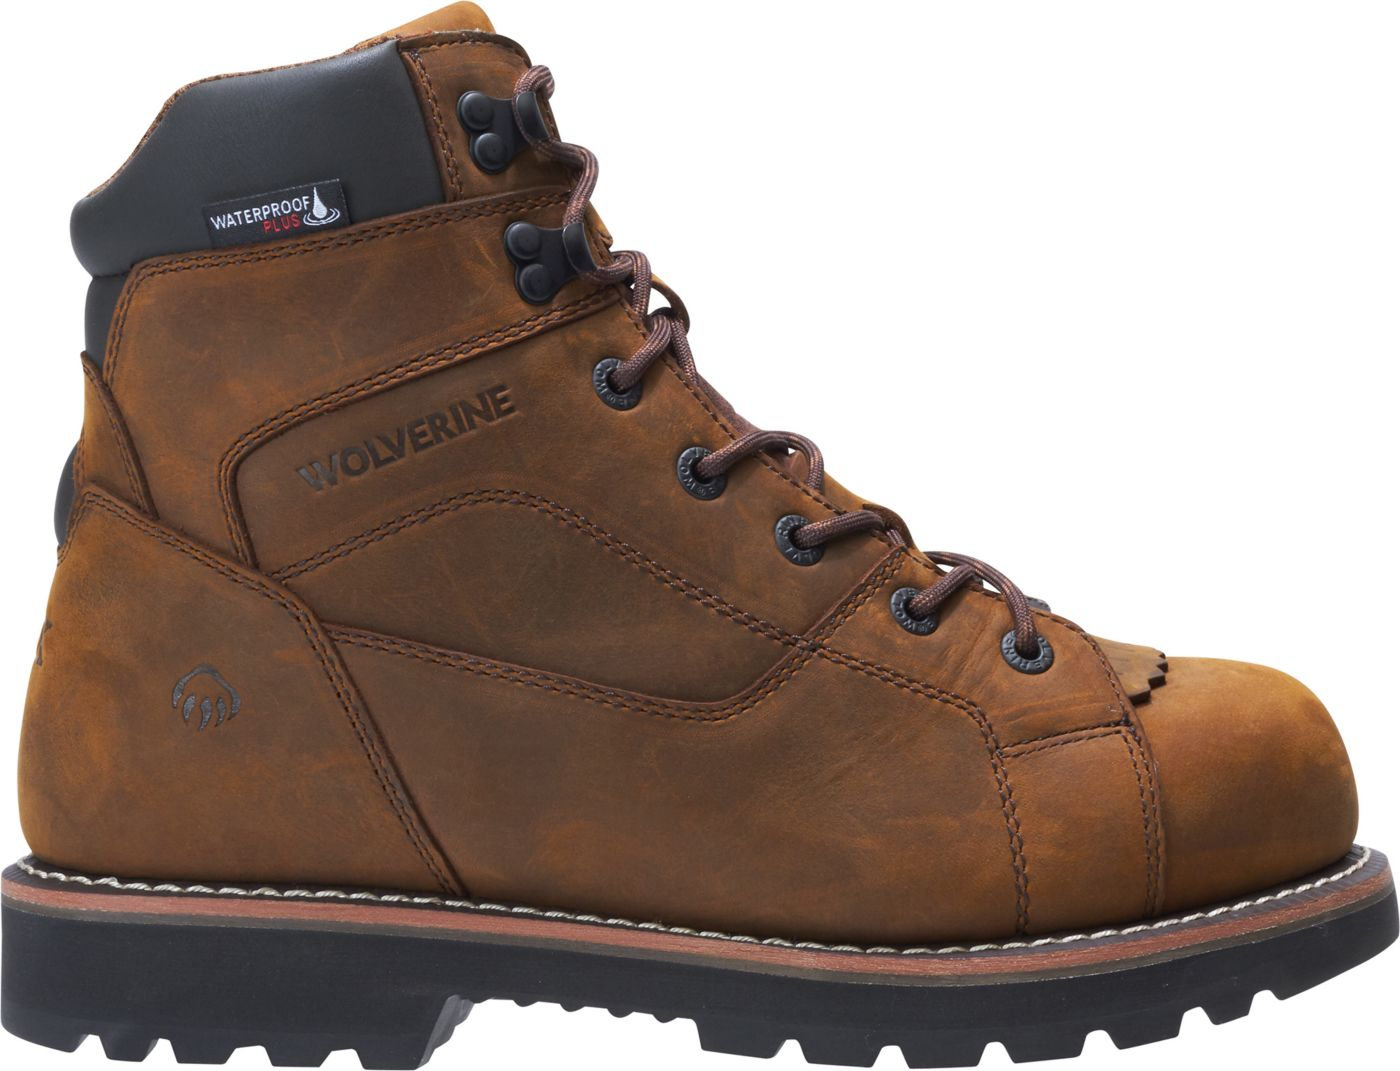 Wolverine Men's Blacktail 600g Waterproof Work Boots